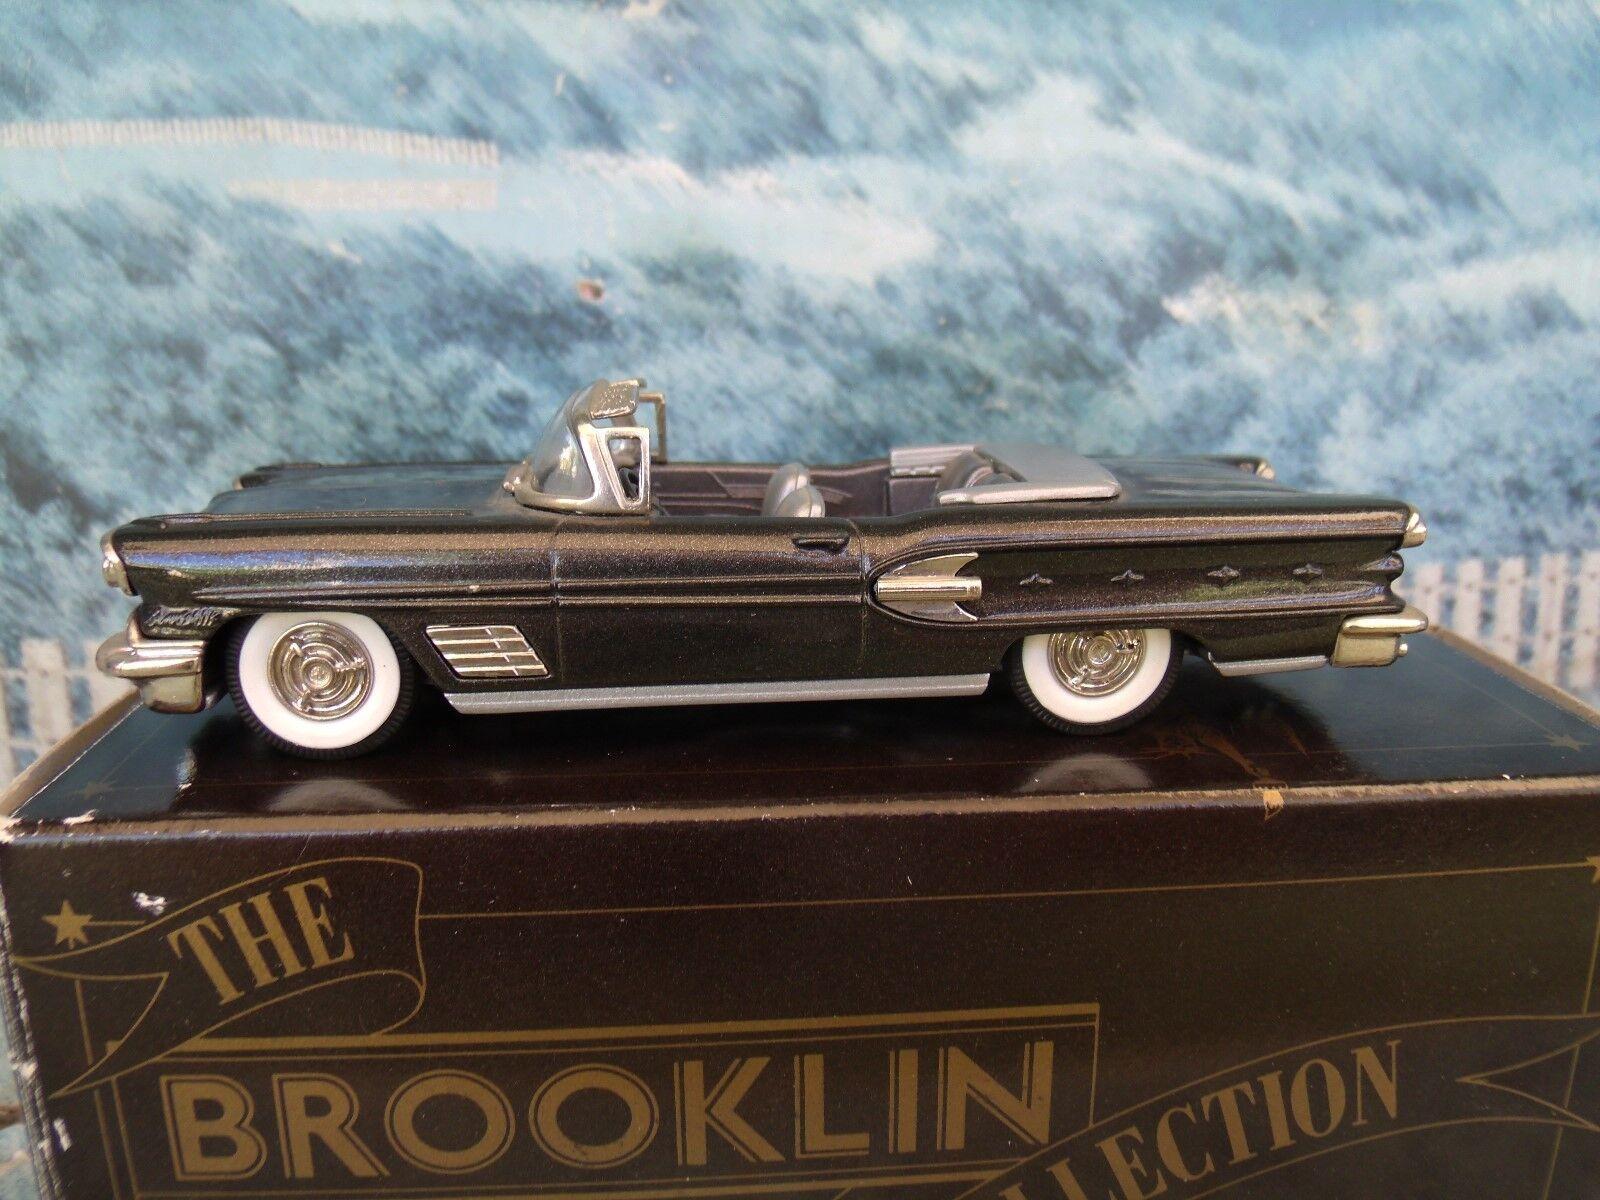 1 43 BROOKLIN MODELS BRK 25 1958 PONTIAC bonneville congreeniblr white metal